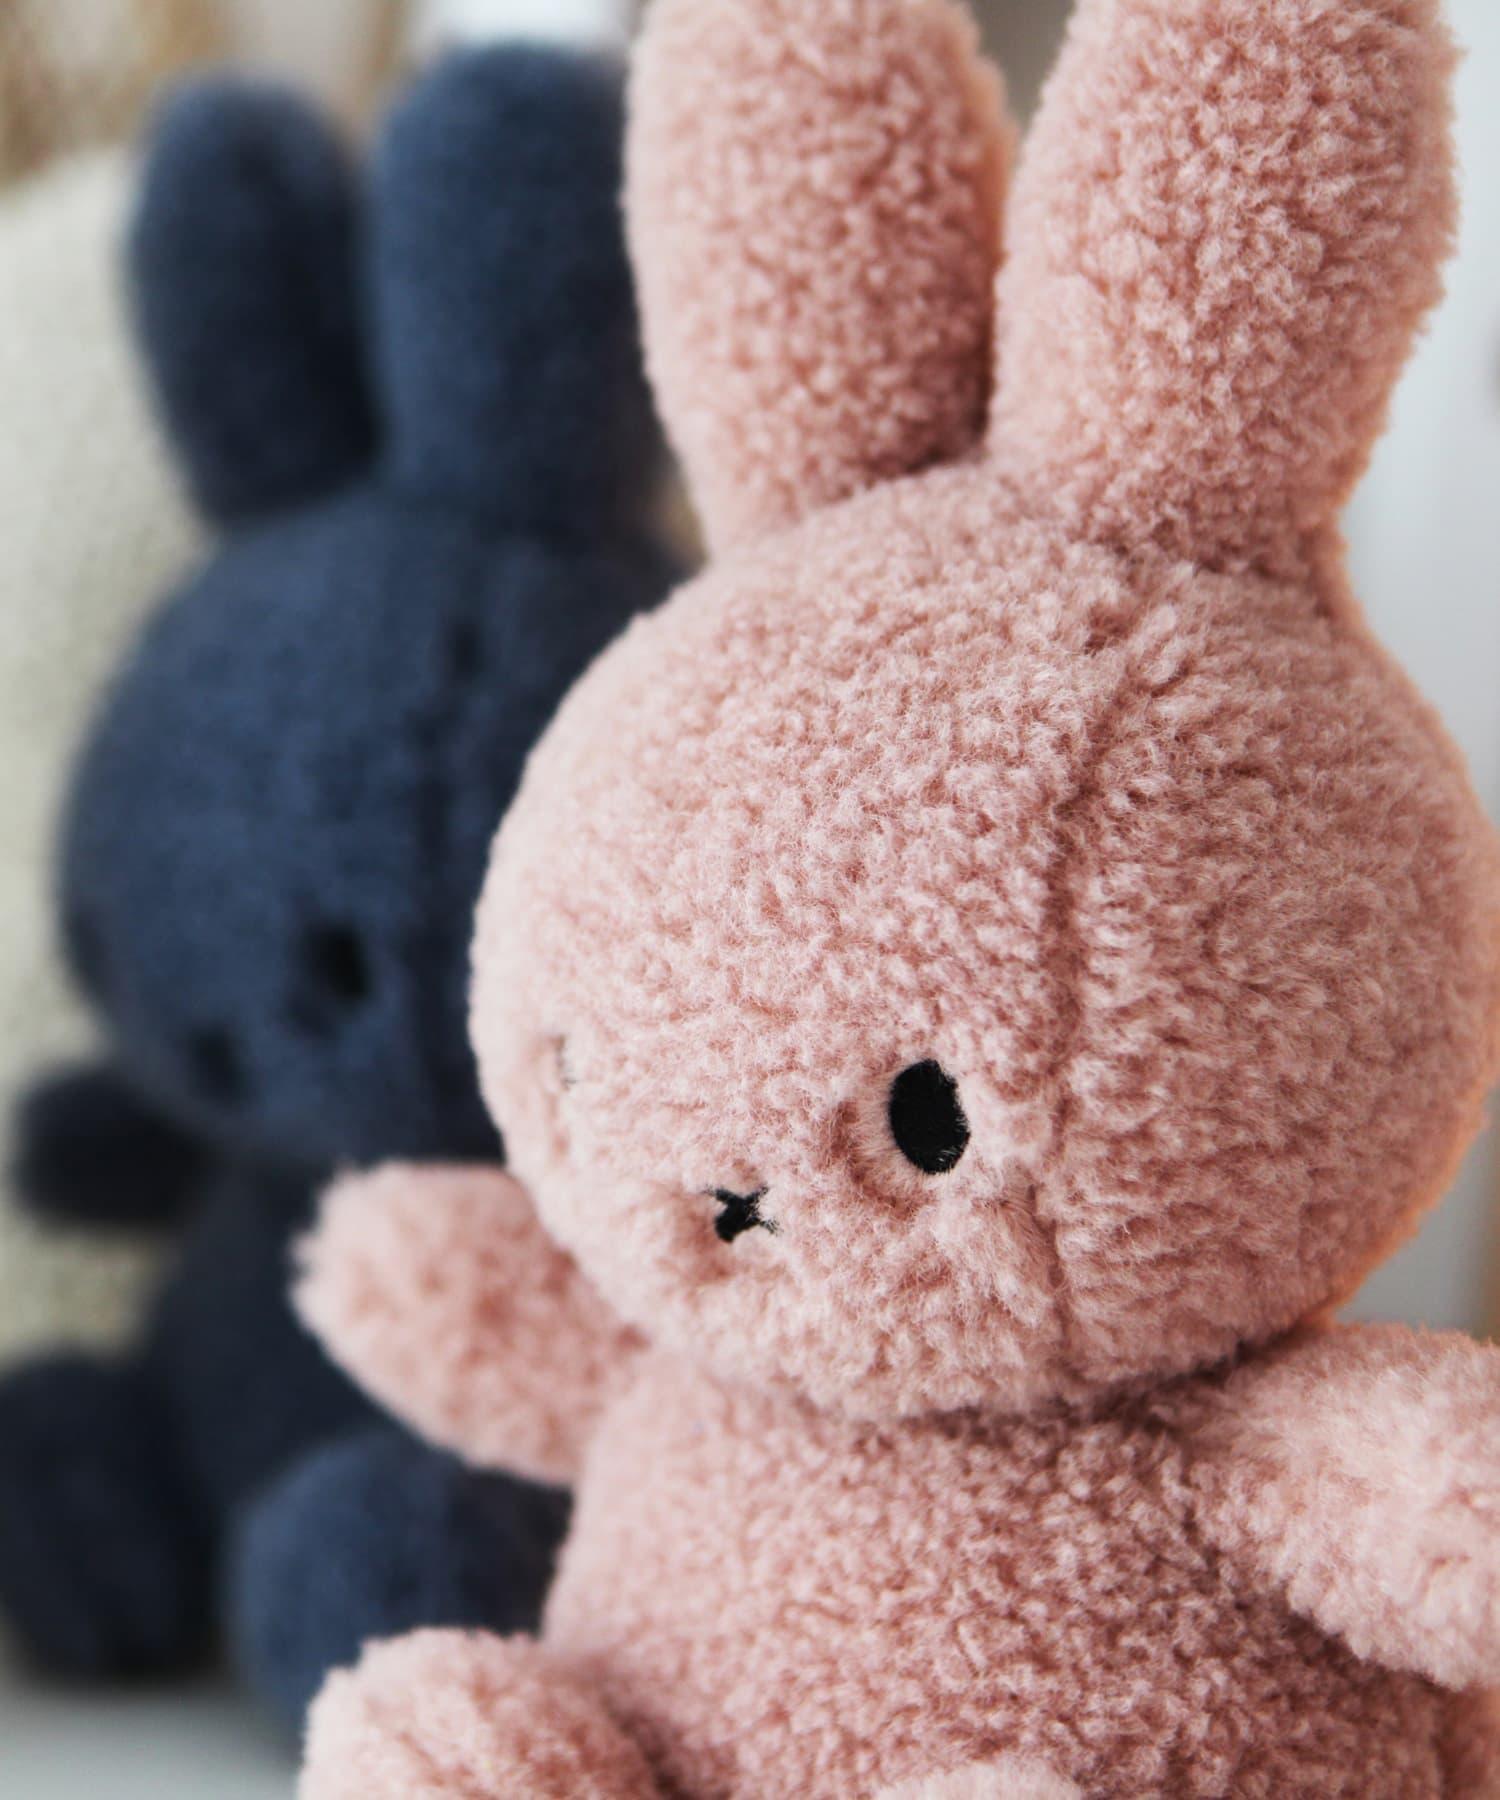 BIRTHDAY BAR(バースデイバー) Miffy Recycle Teddy 23cm ミッフィーリサイクルテディ